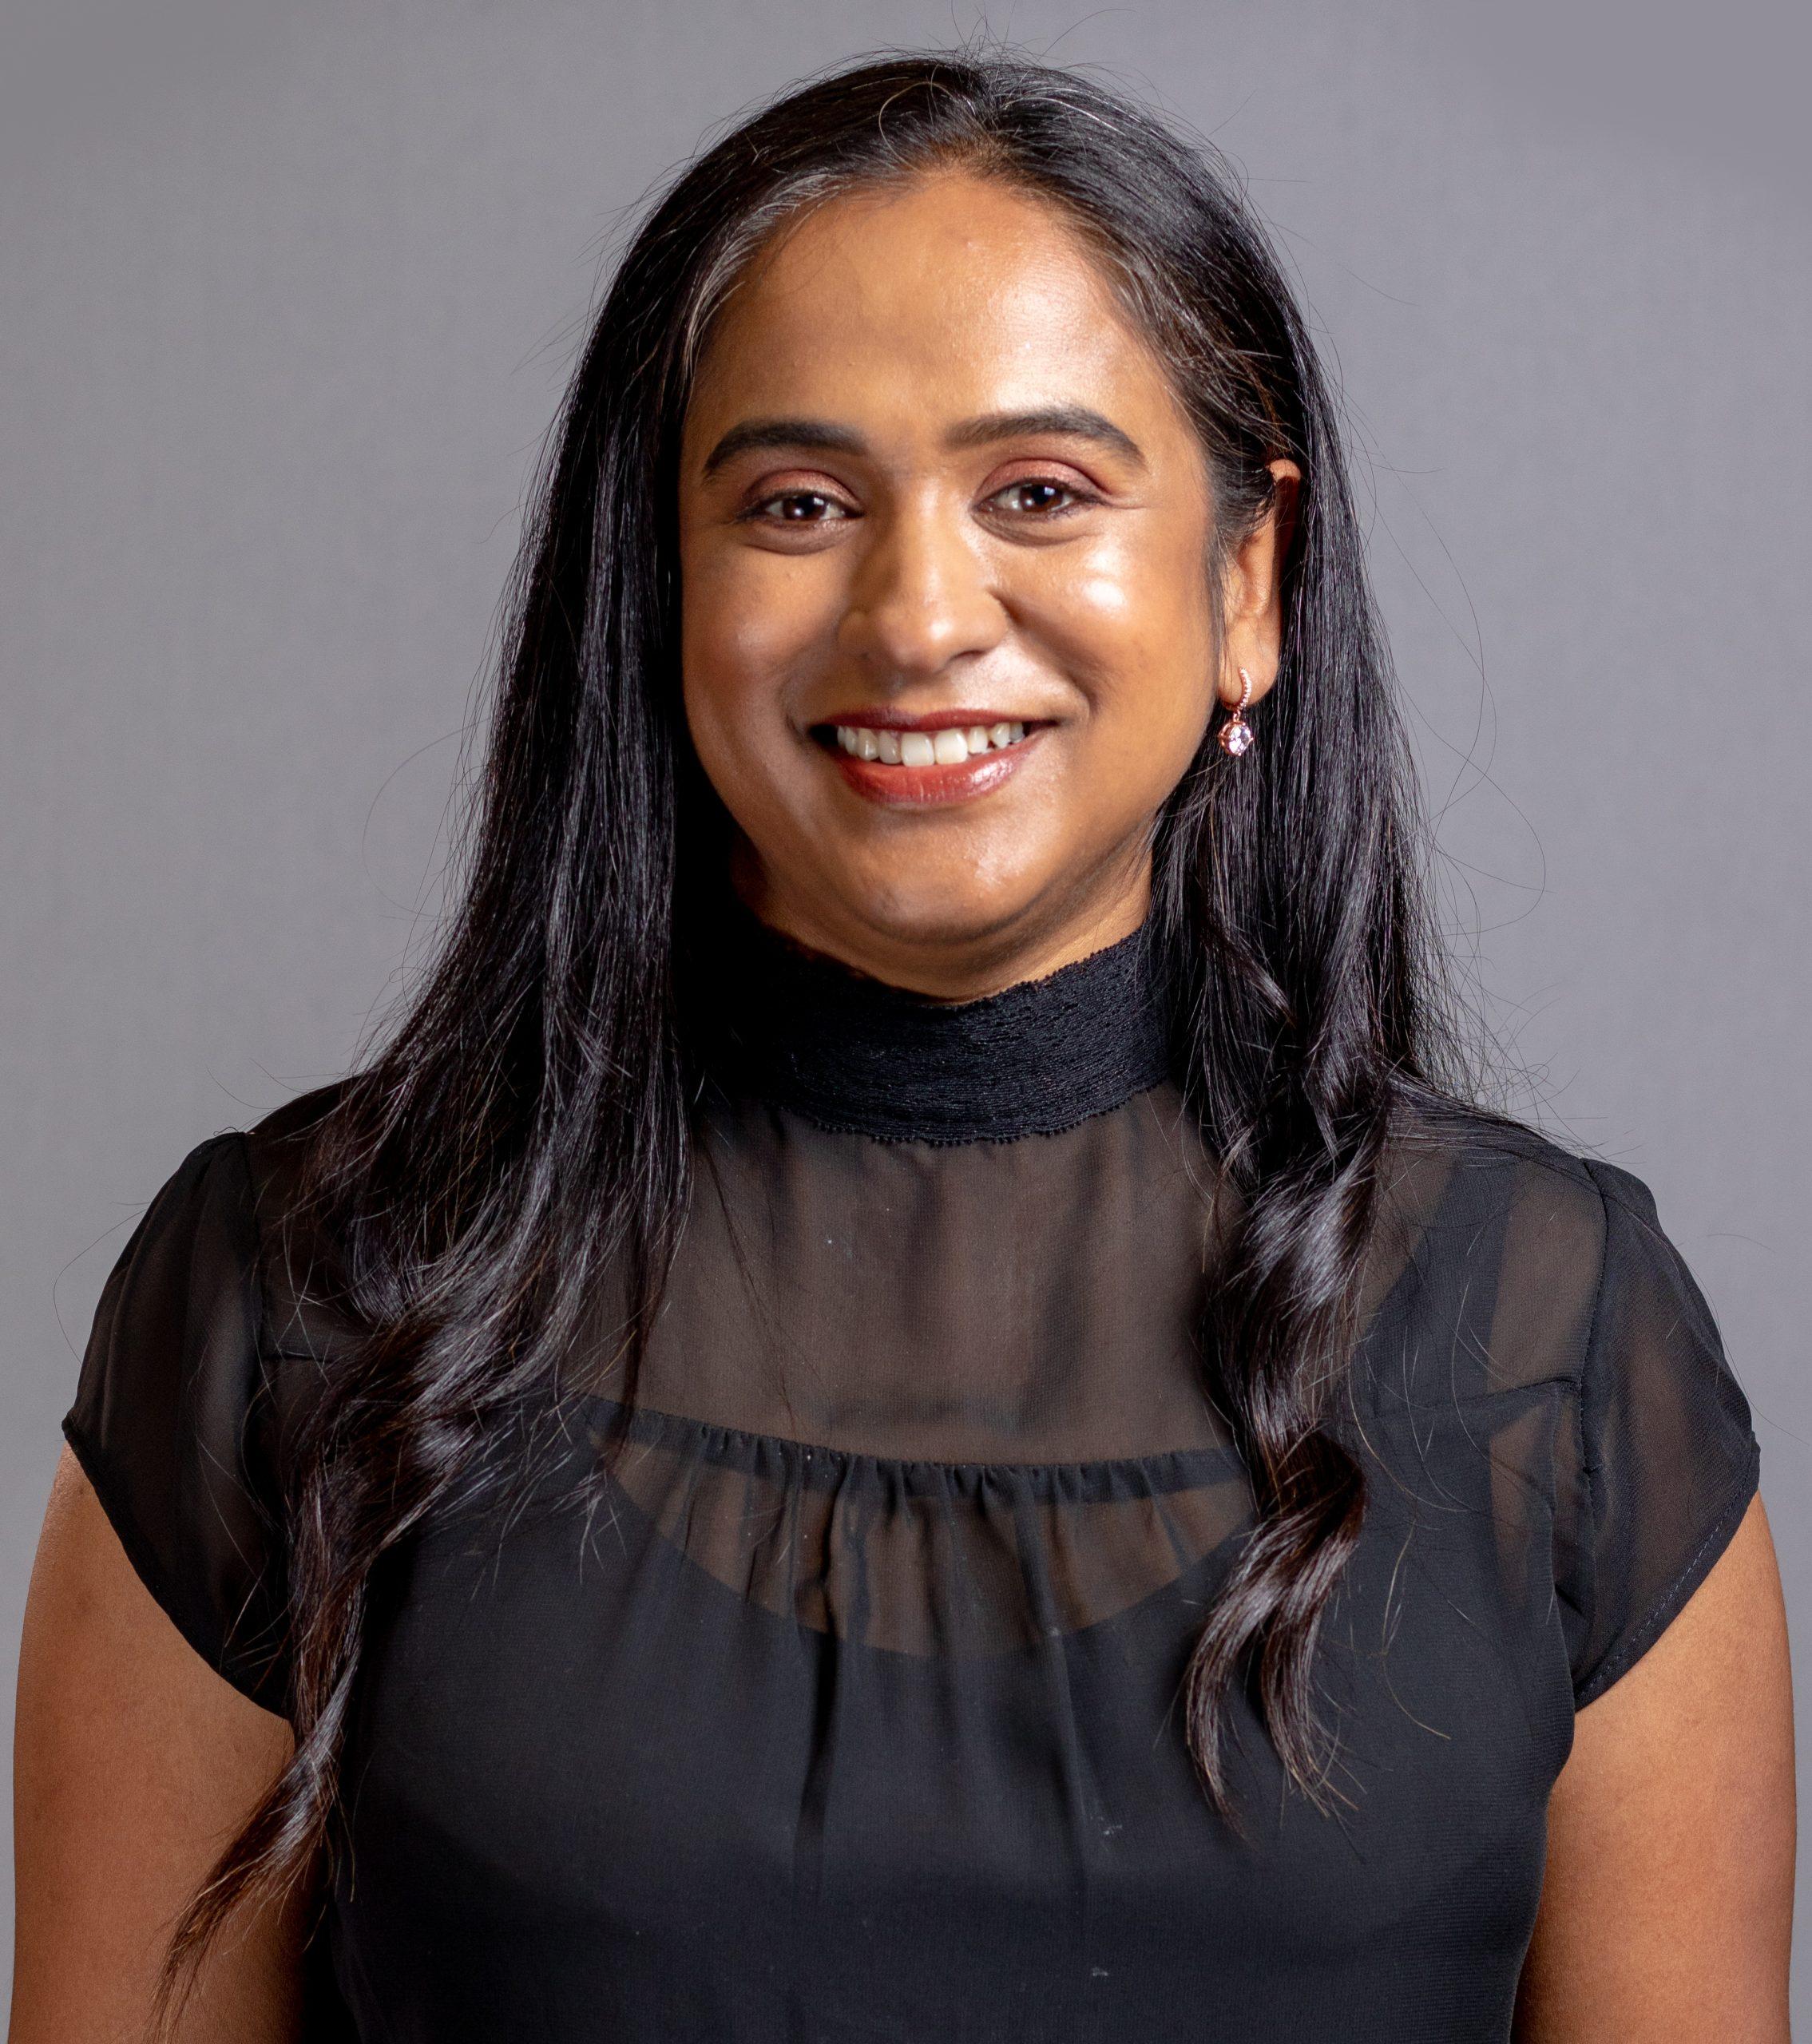 AAVEA says farewell to outgoing board member Fatima Anter